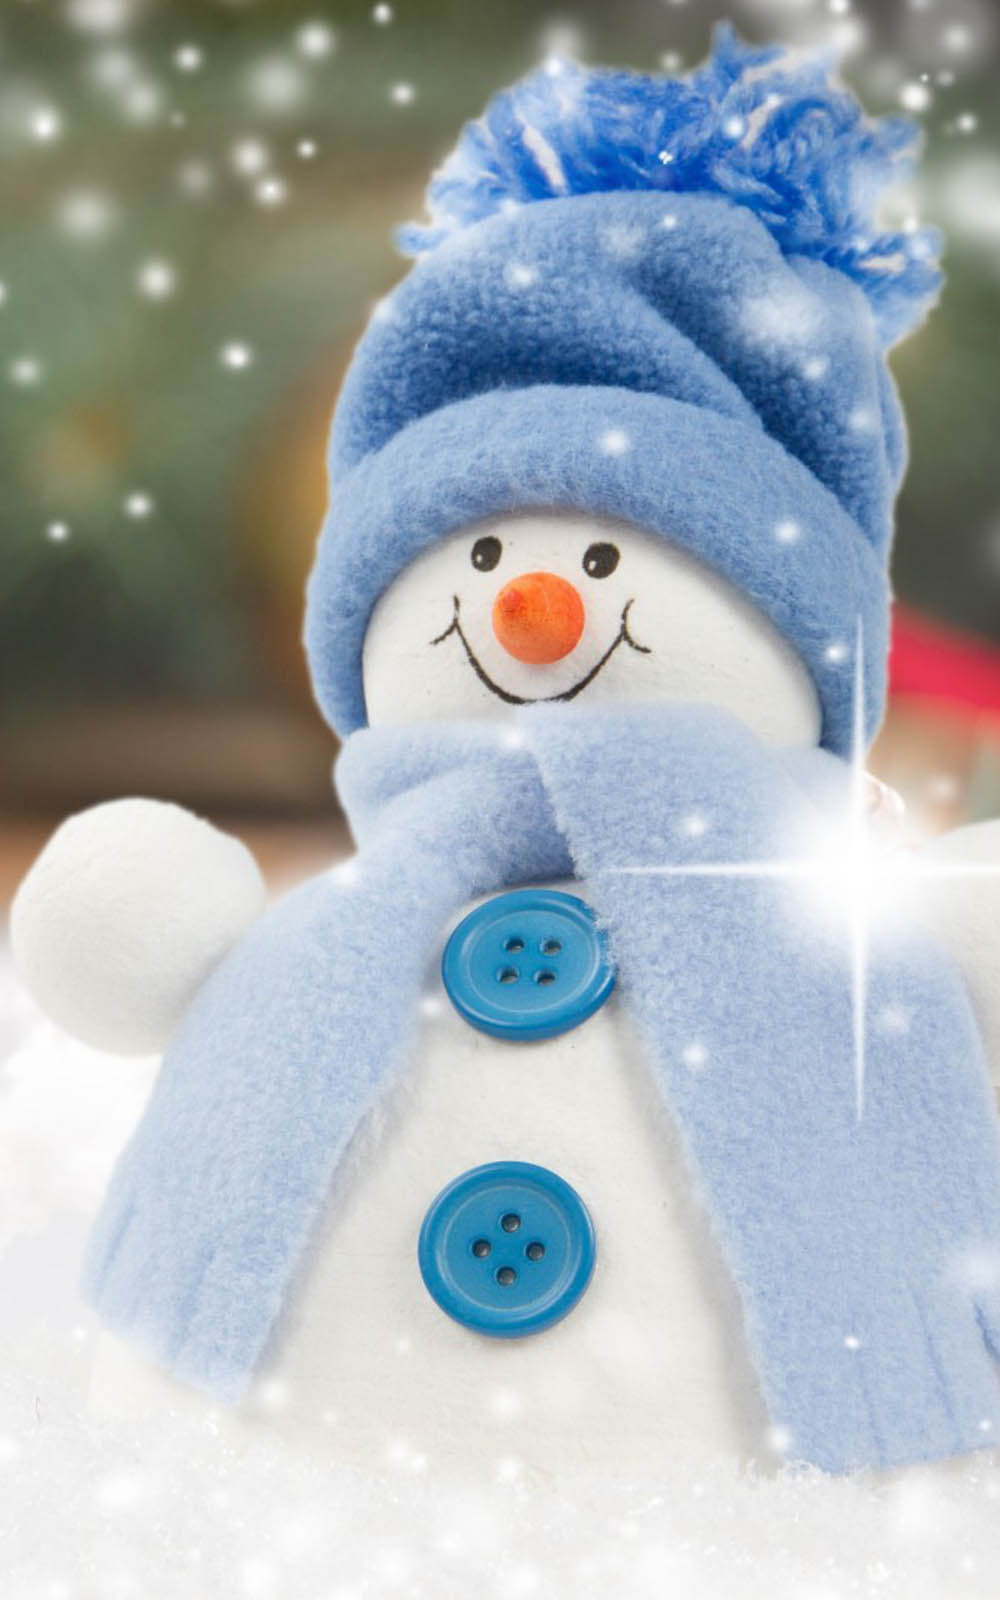 Siege Girls Anime Wallpaper Download Cute Christmas Snowman Free Pure 4k Ultra Hd